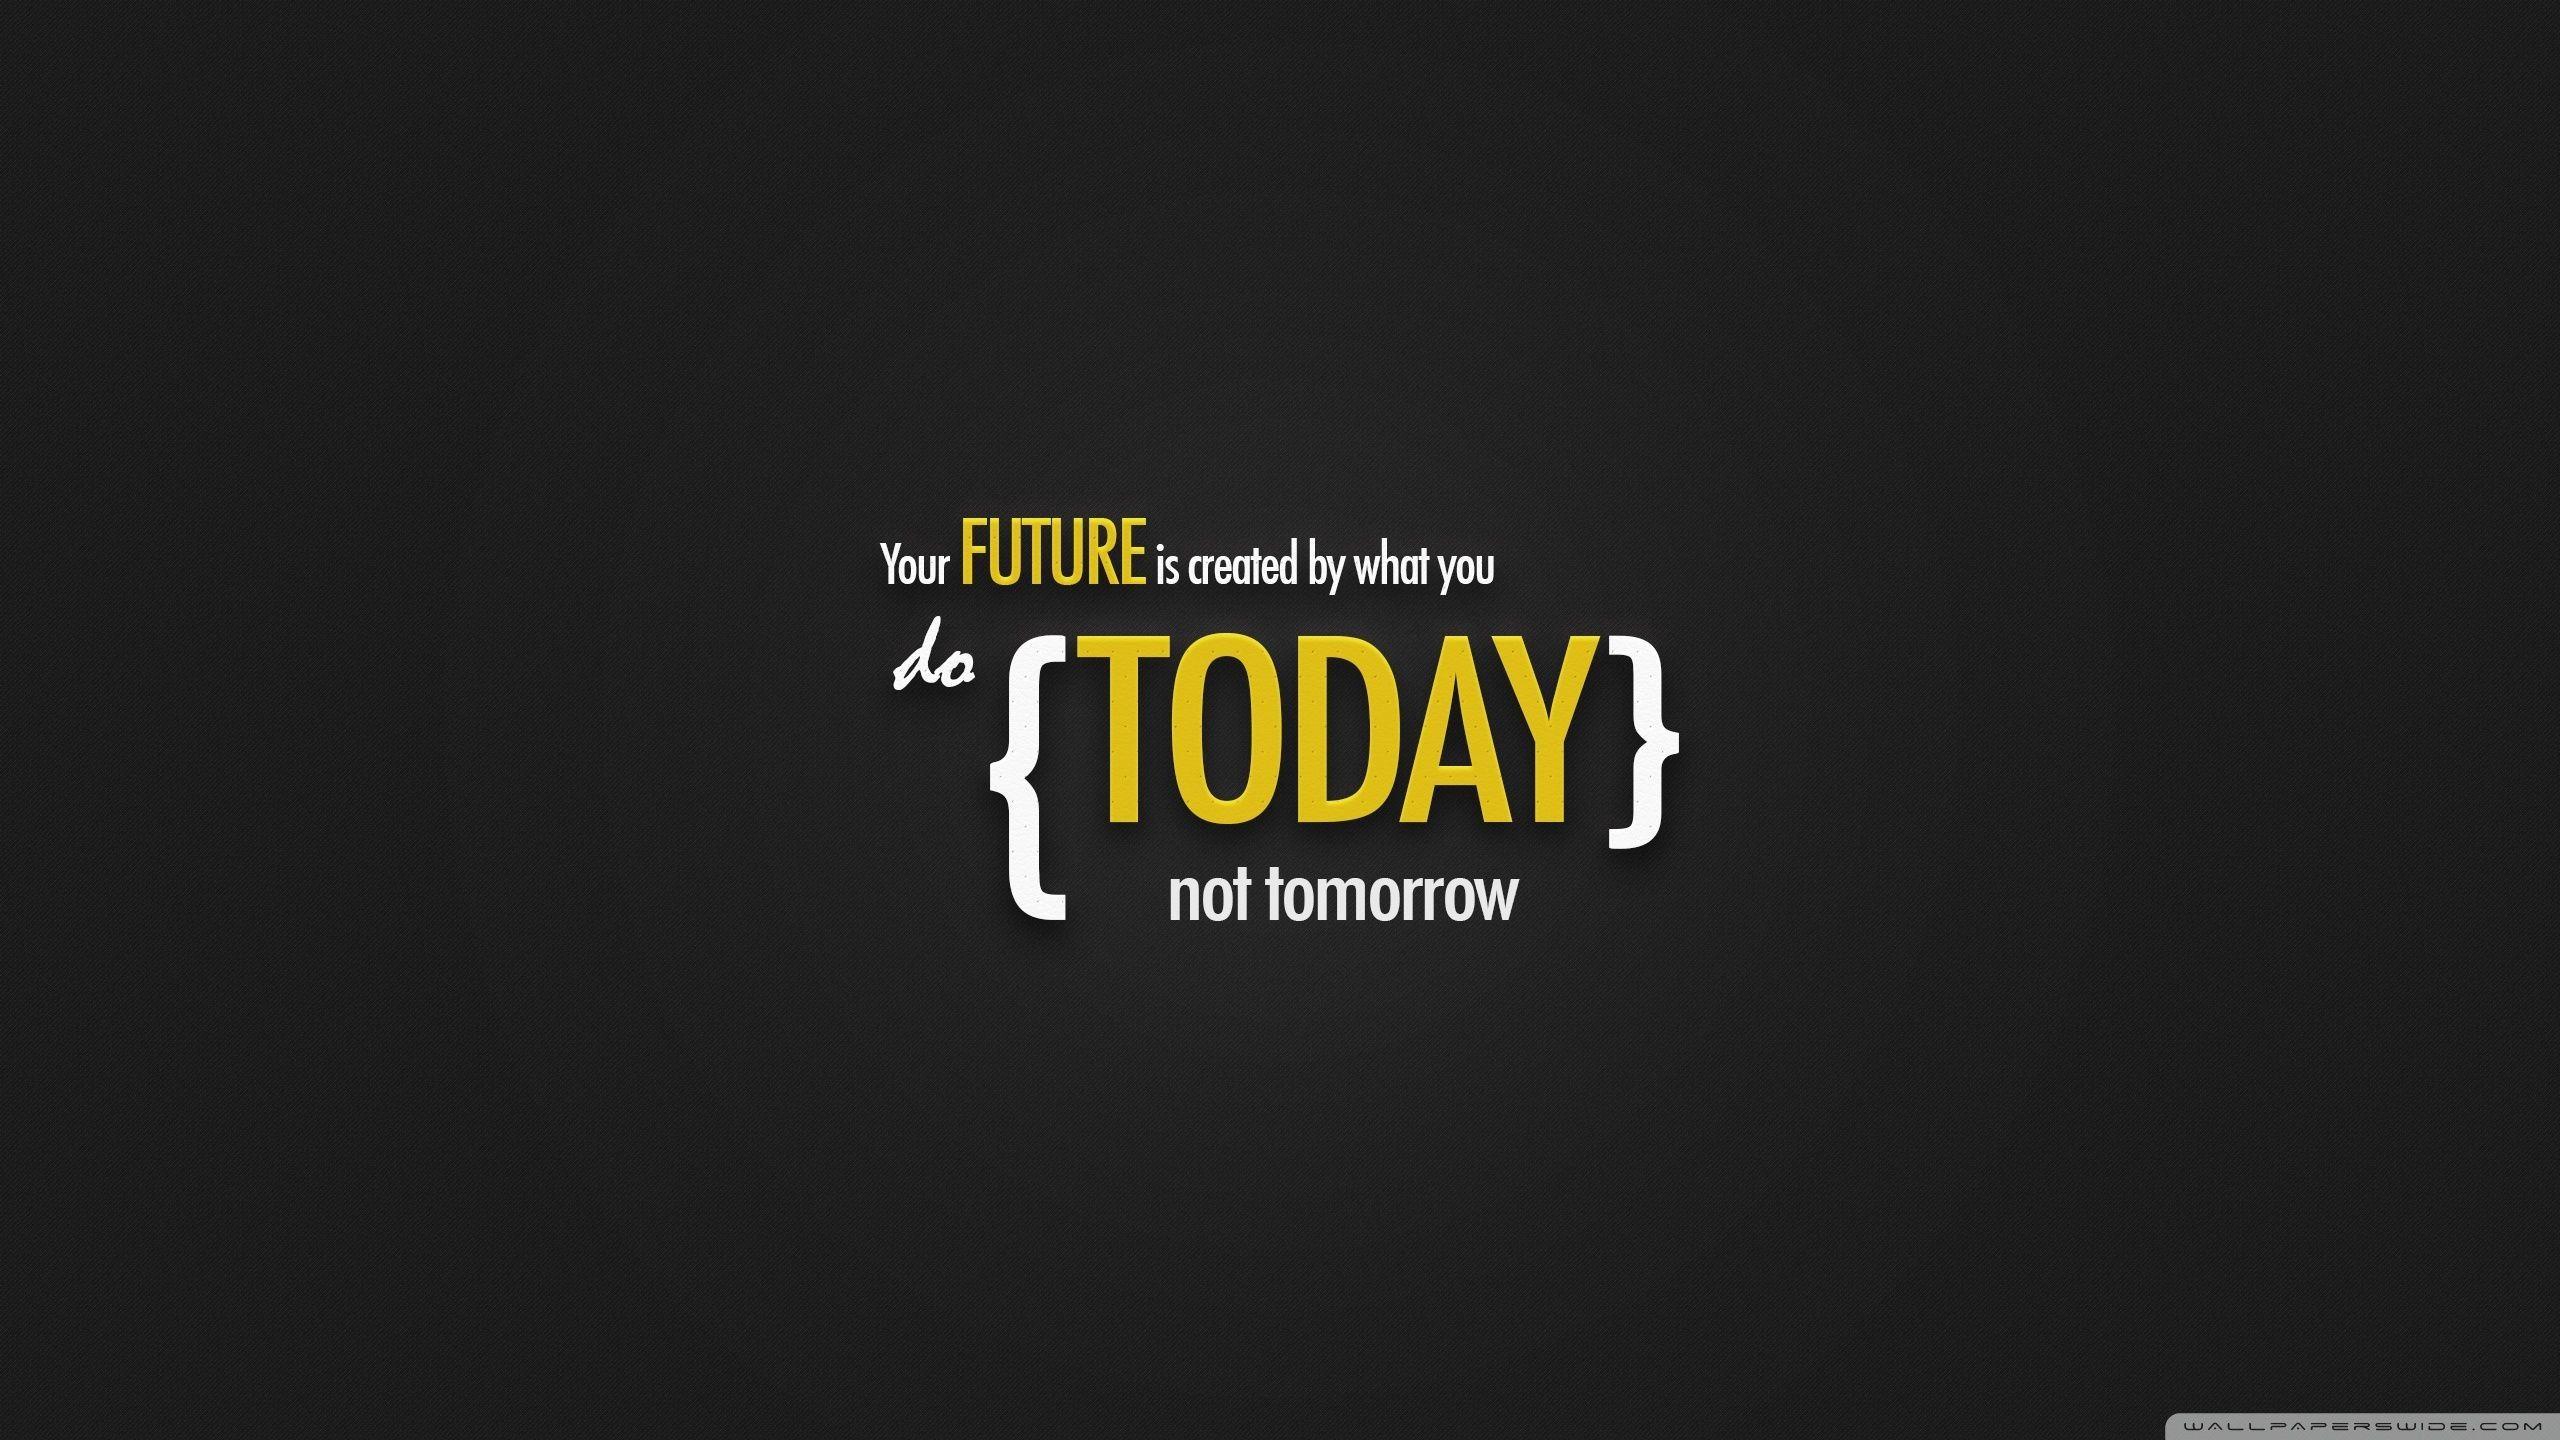 81unique Inspirational Quotes Wallpaper Hd Free Download In 2020 Inspirational Quotes Wallpapers Inspirational Desktop Wallpaper Inspirational Wallpapers Hd